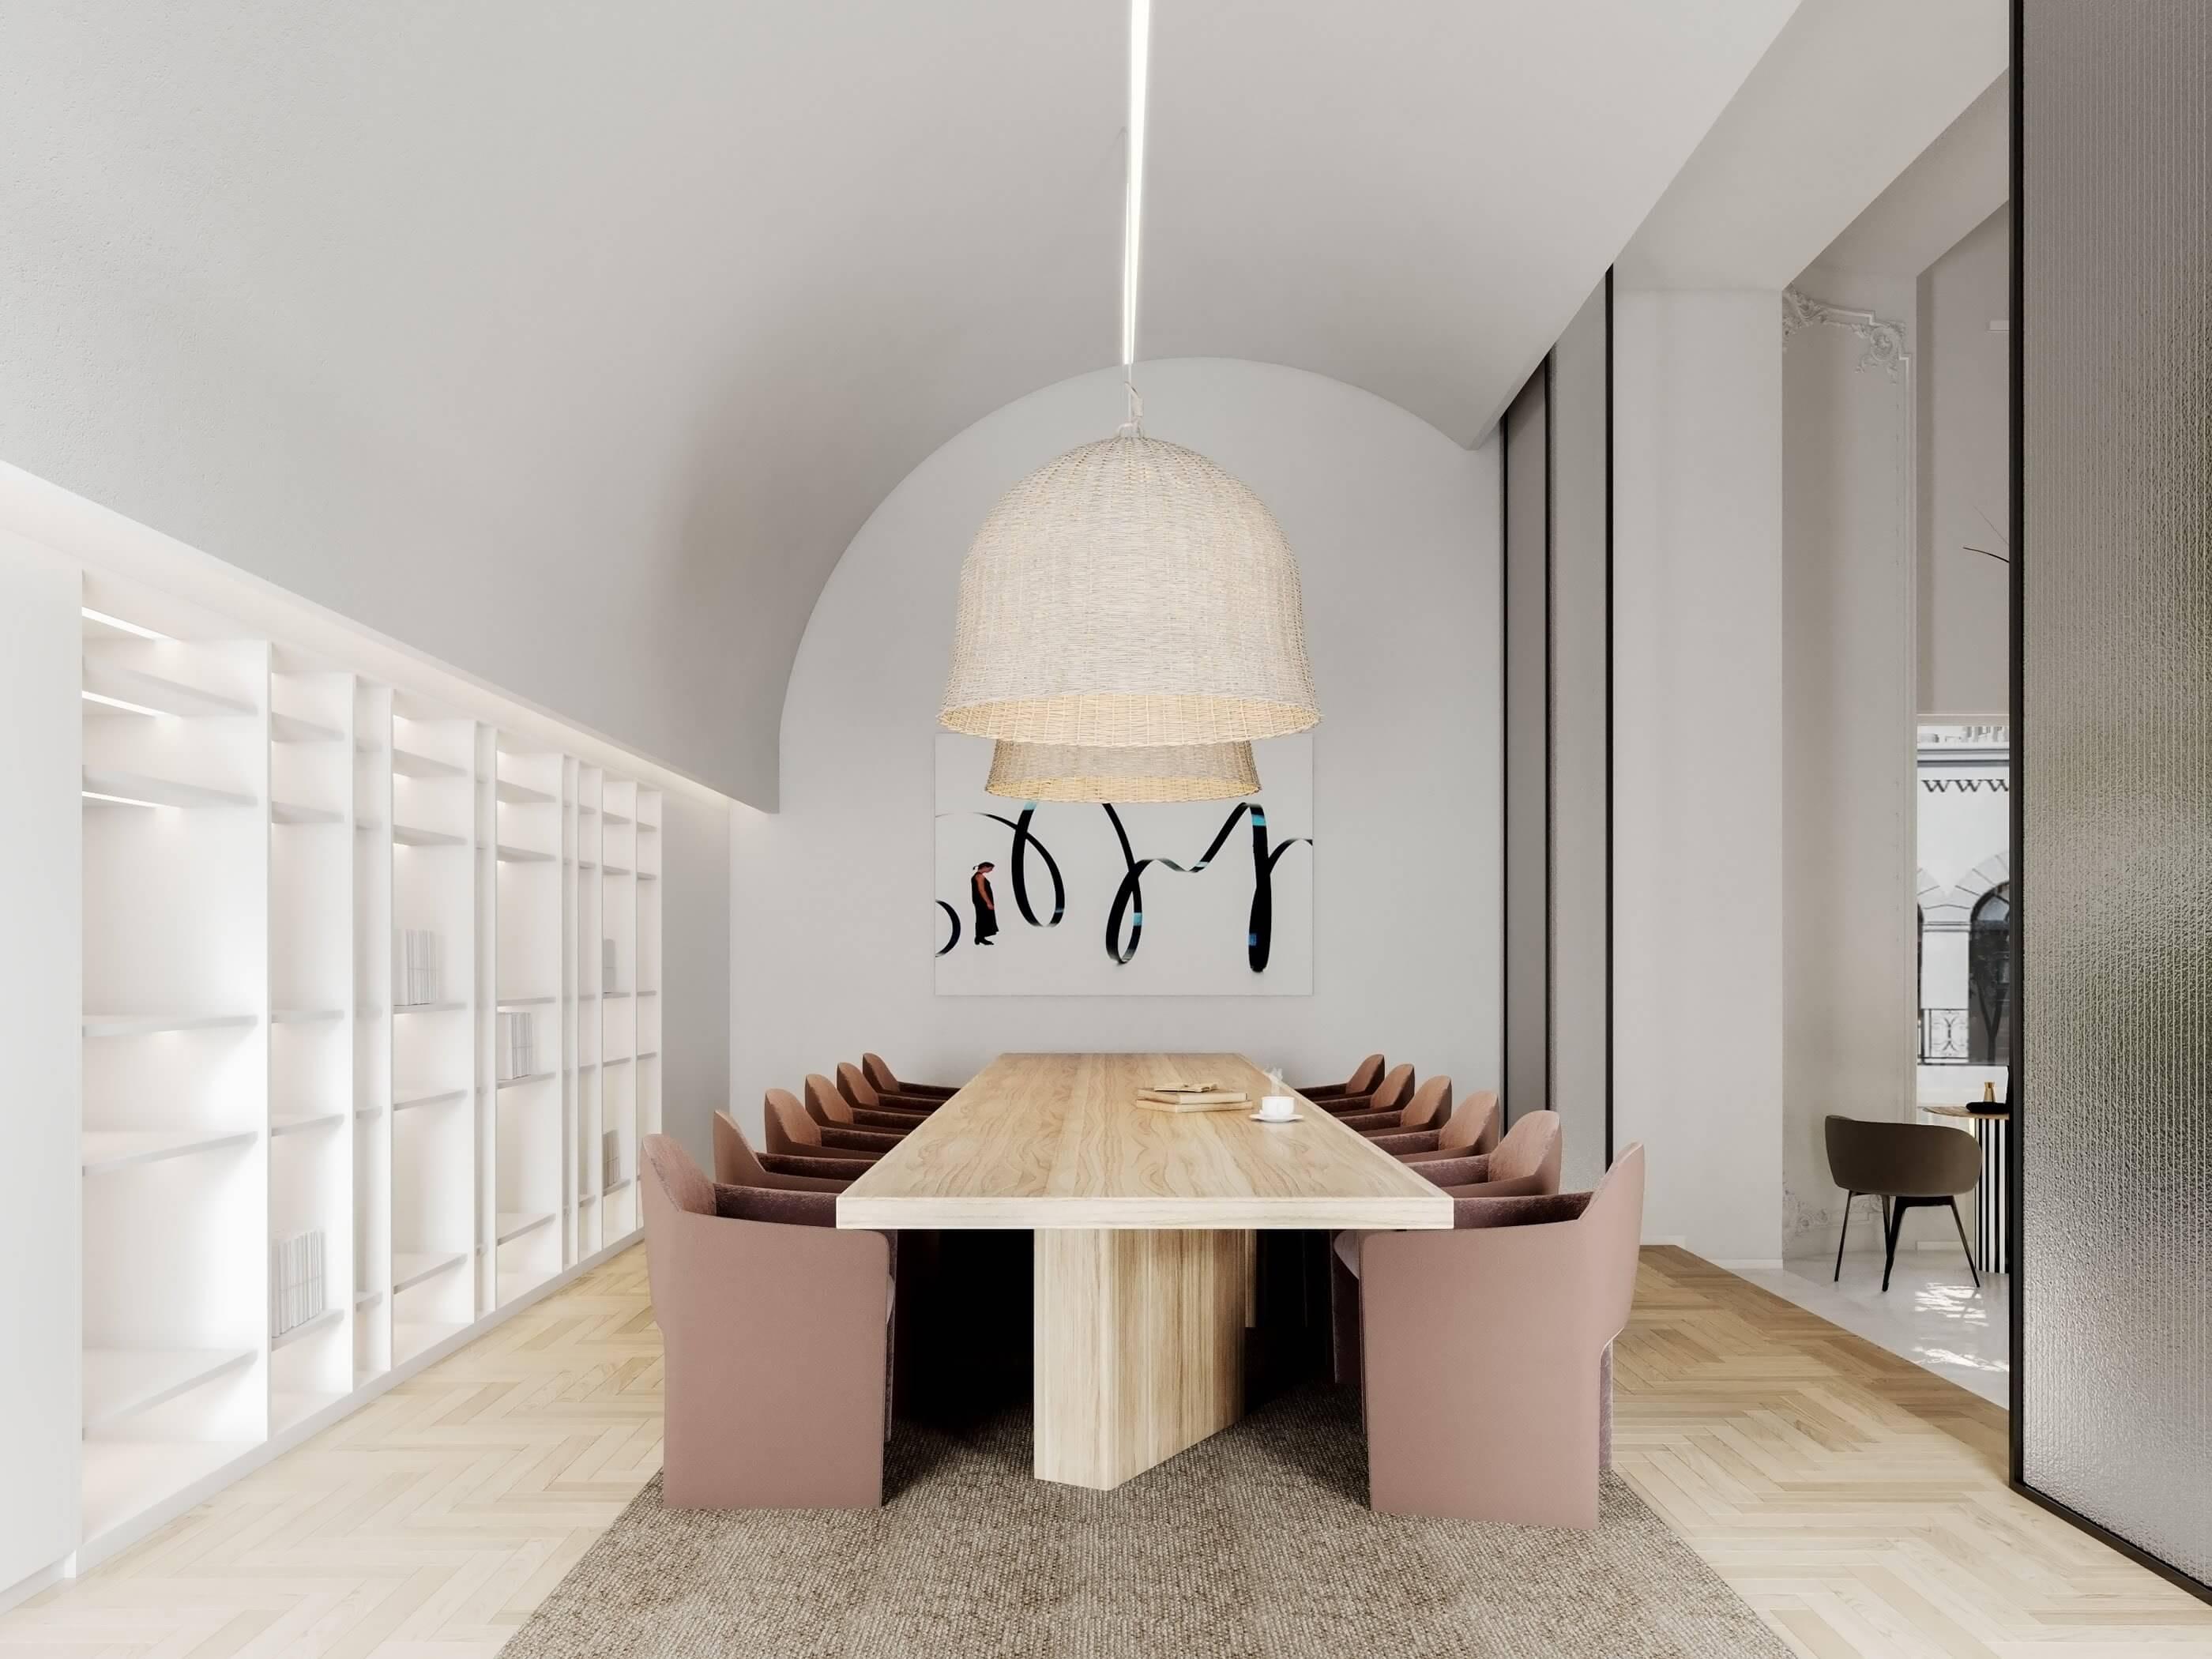 Modern bar restaurant design dining area wood table chair - cgi visualization